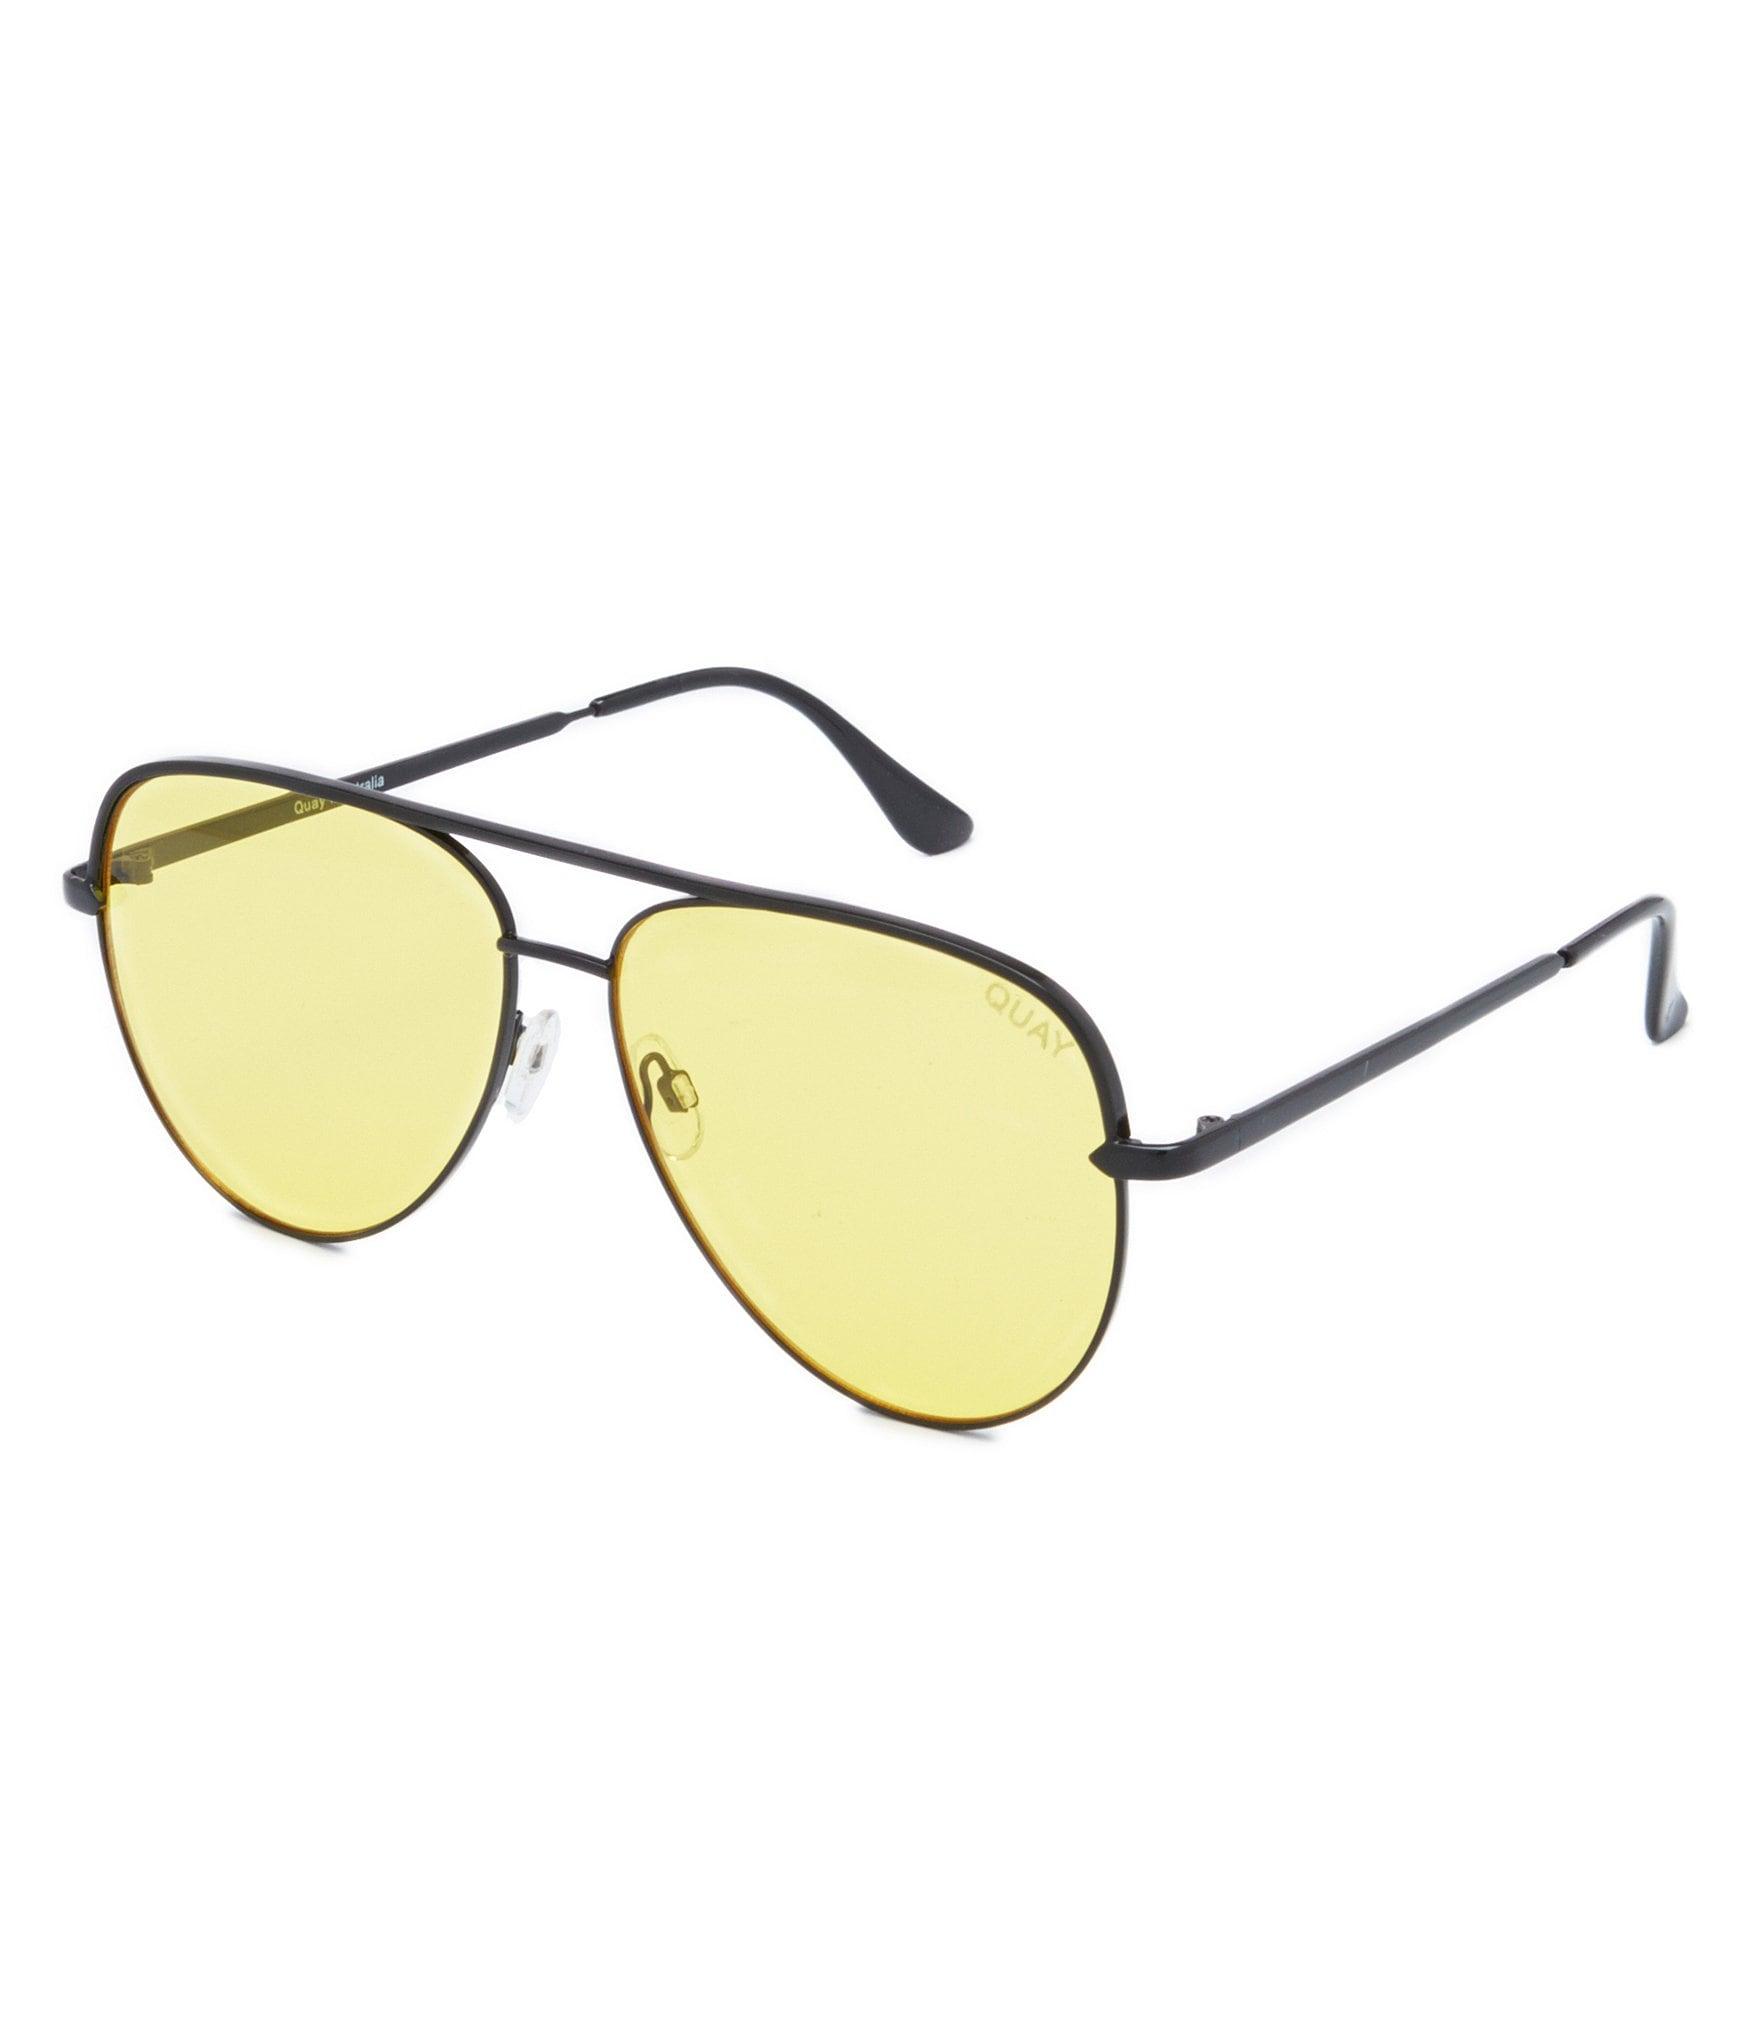 56bc38c65c Quay Australia Sahara Oversized Aviator Sunglasses